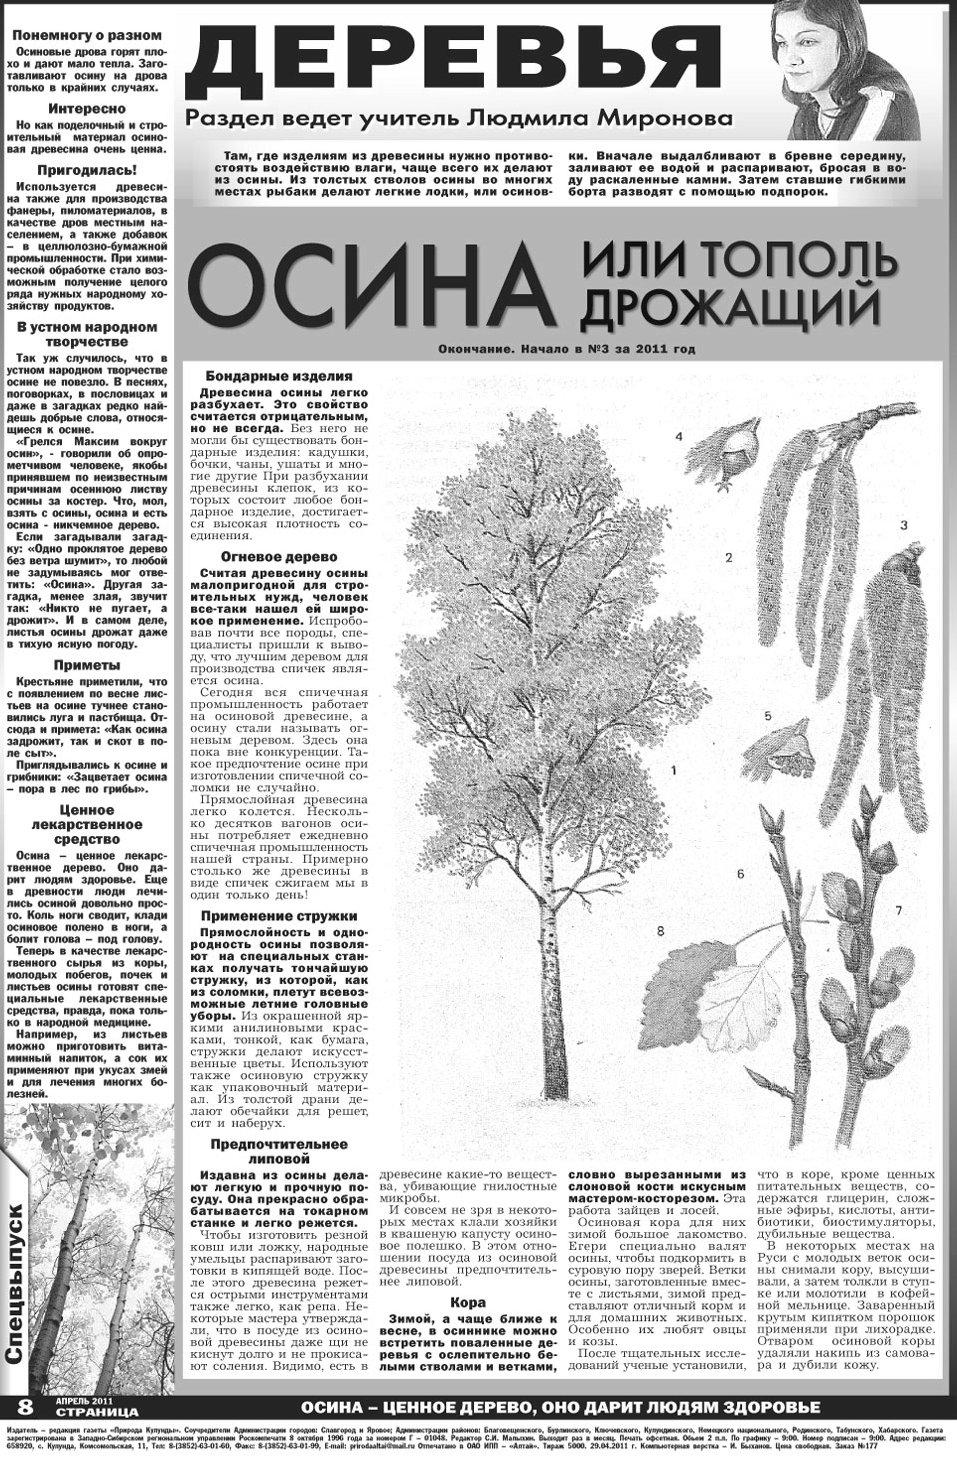 molot-tora-kapli-kupit-ukraina-sumi